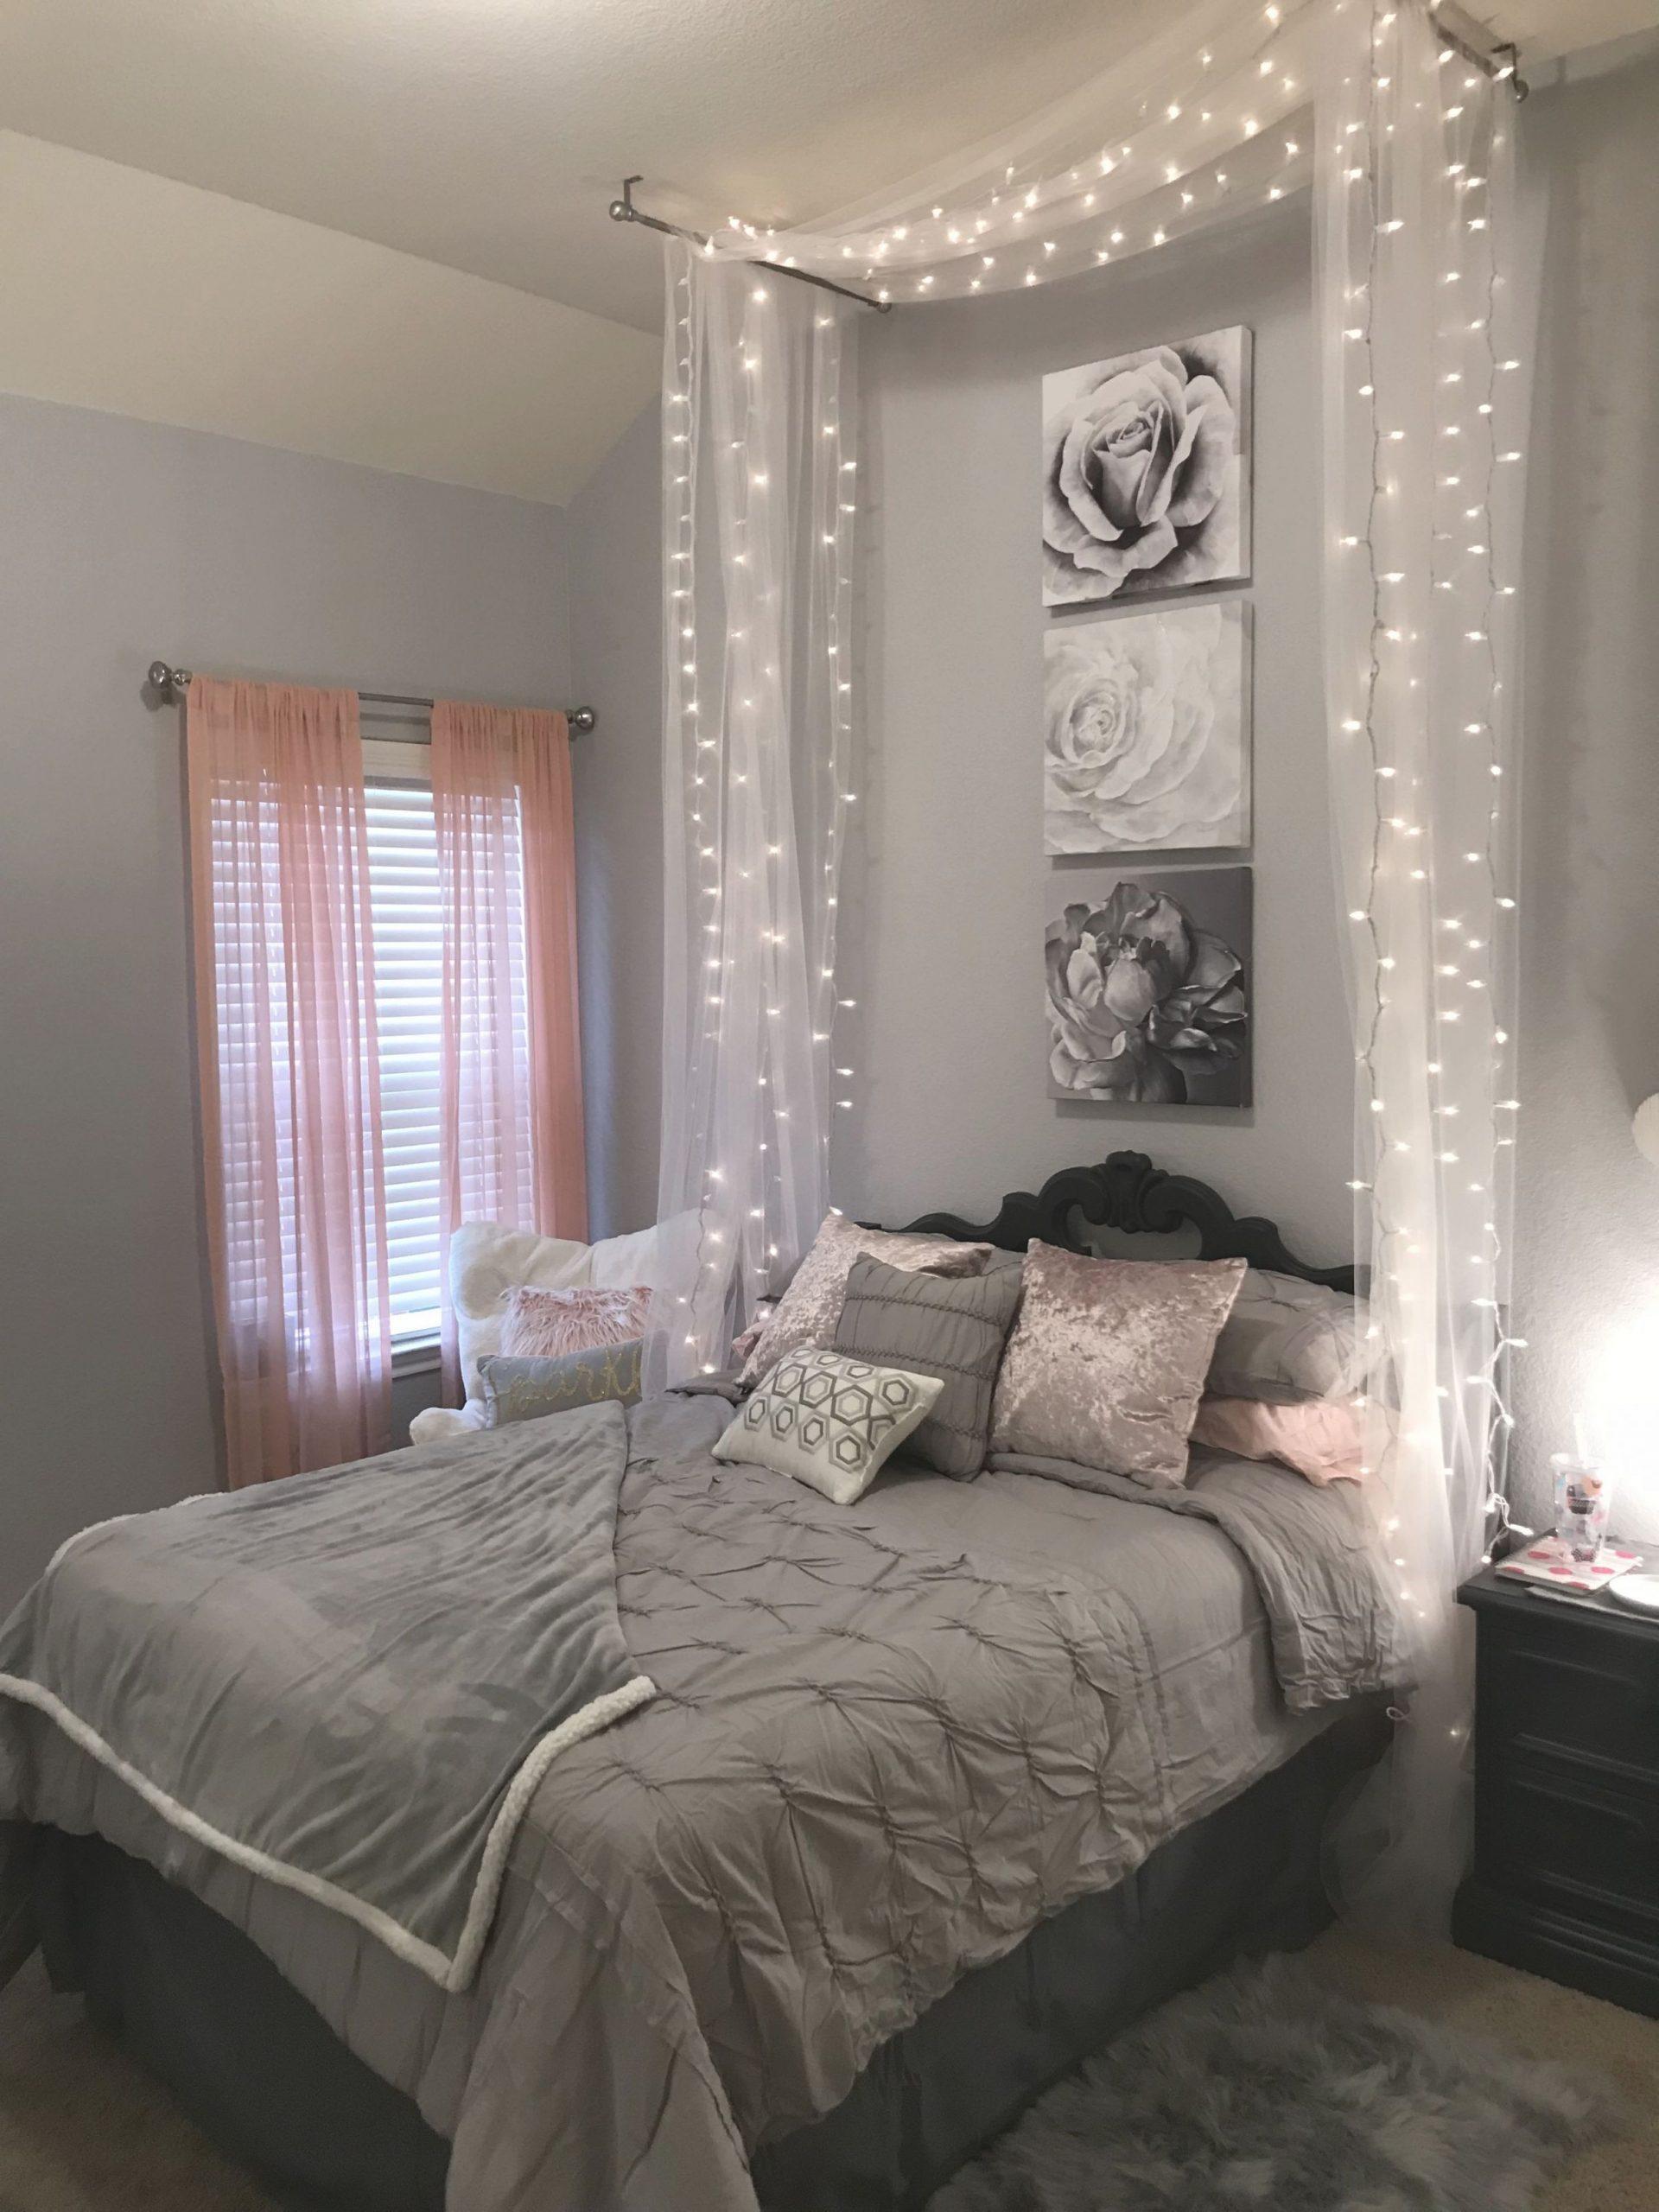 Luxury Girl Room Ideas Teenagers Decorating Ideas In Bedroom for Best of Decorating Ideas For Small Bedroom